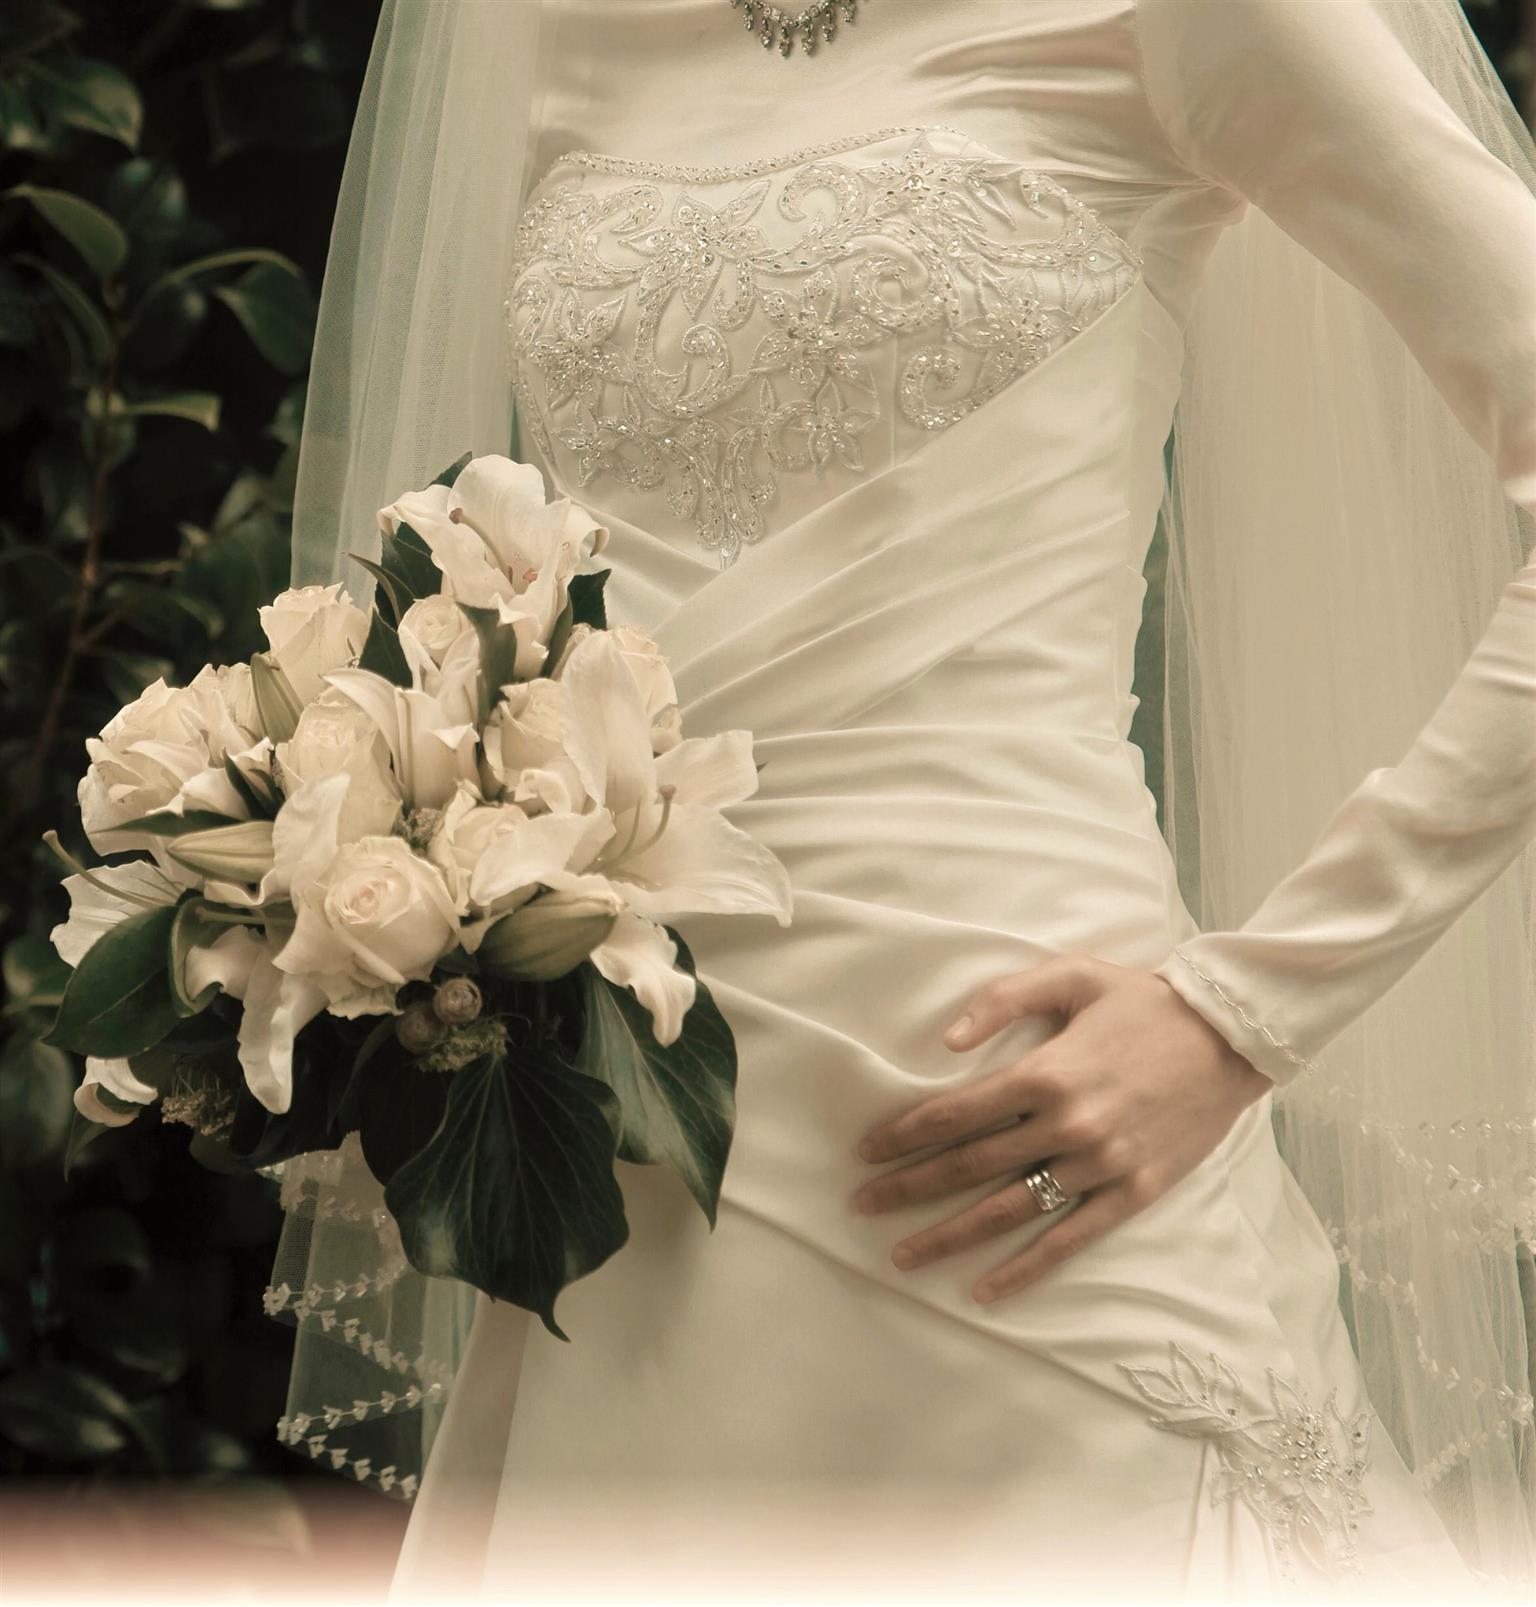 White Wedding Dress & Indian Wedding Dress For Hire